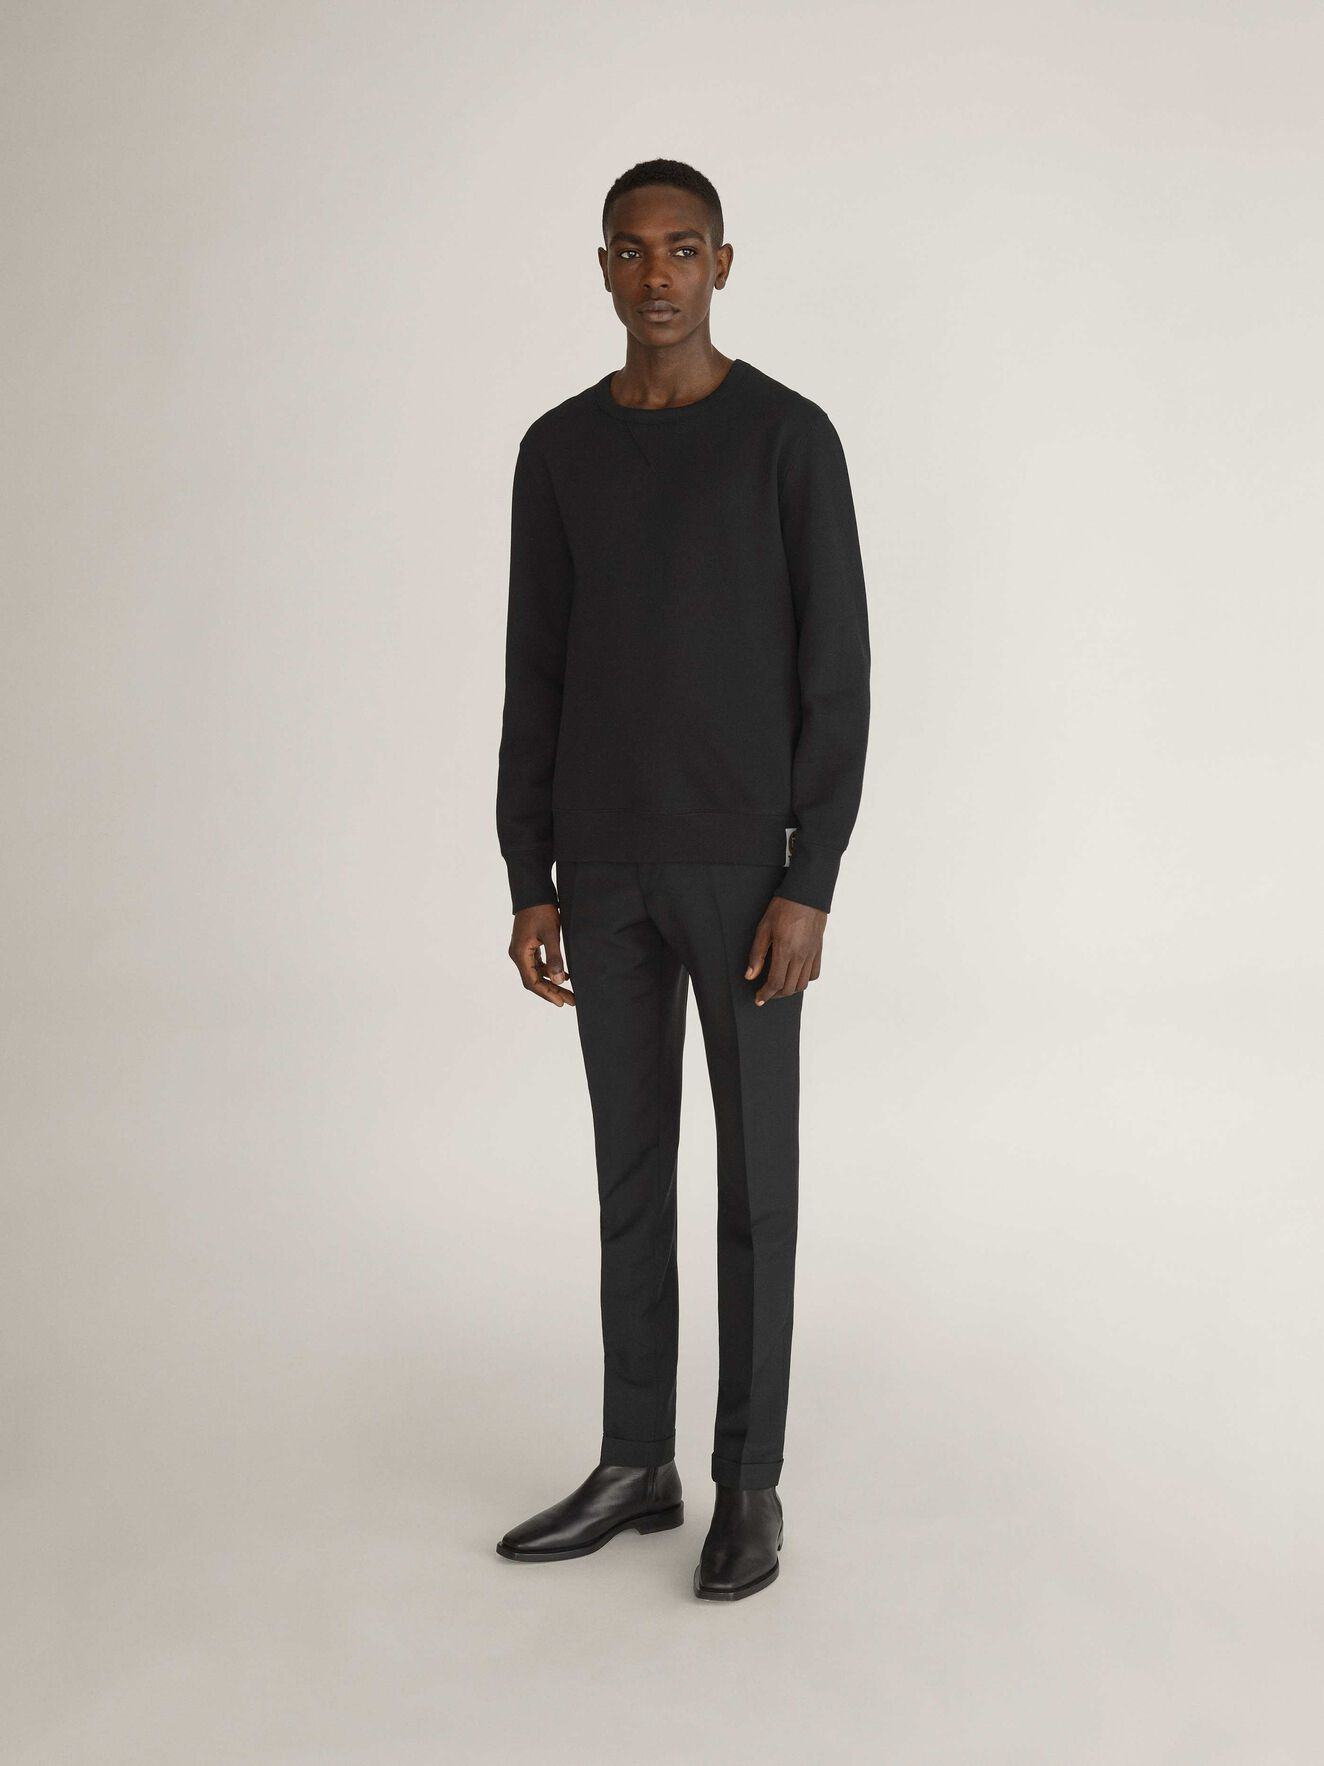 Dinos Sweatshirt in Black from Tiger of Sweden